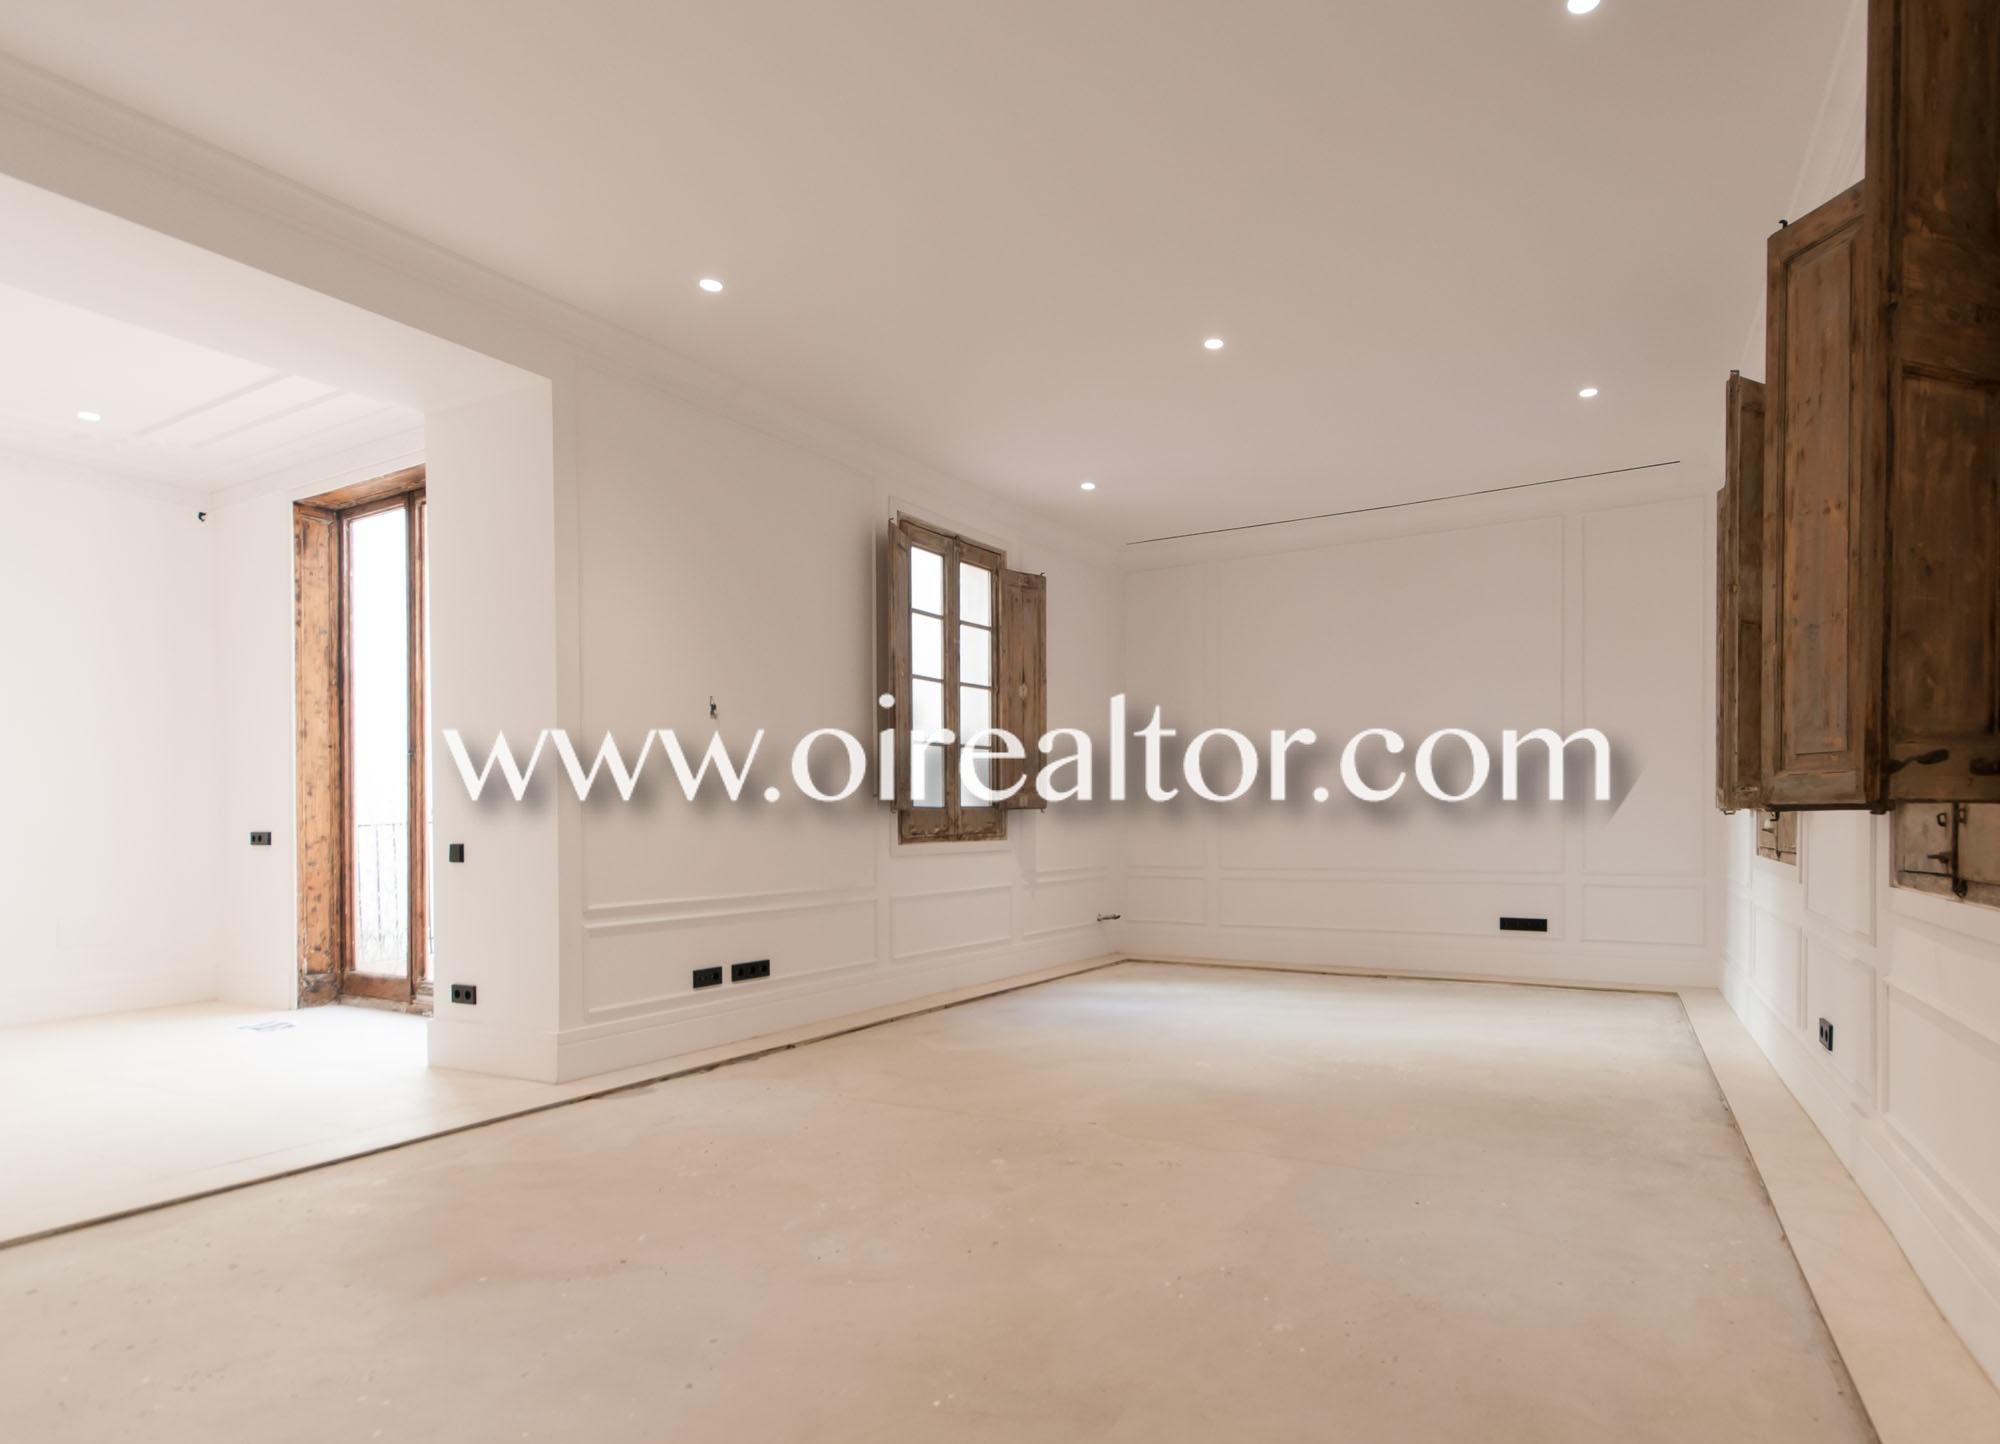 Квартира для продажи в Gotic, Барселона